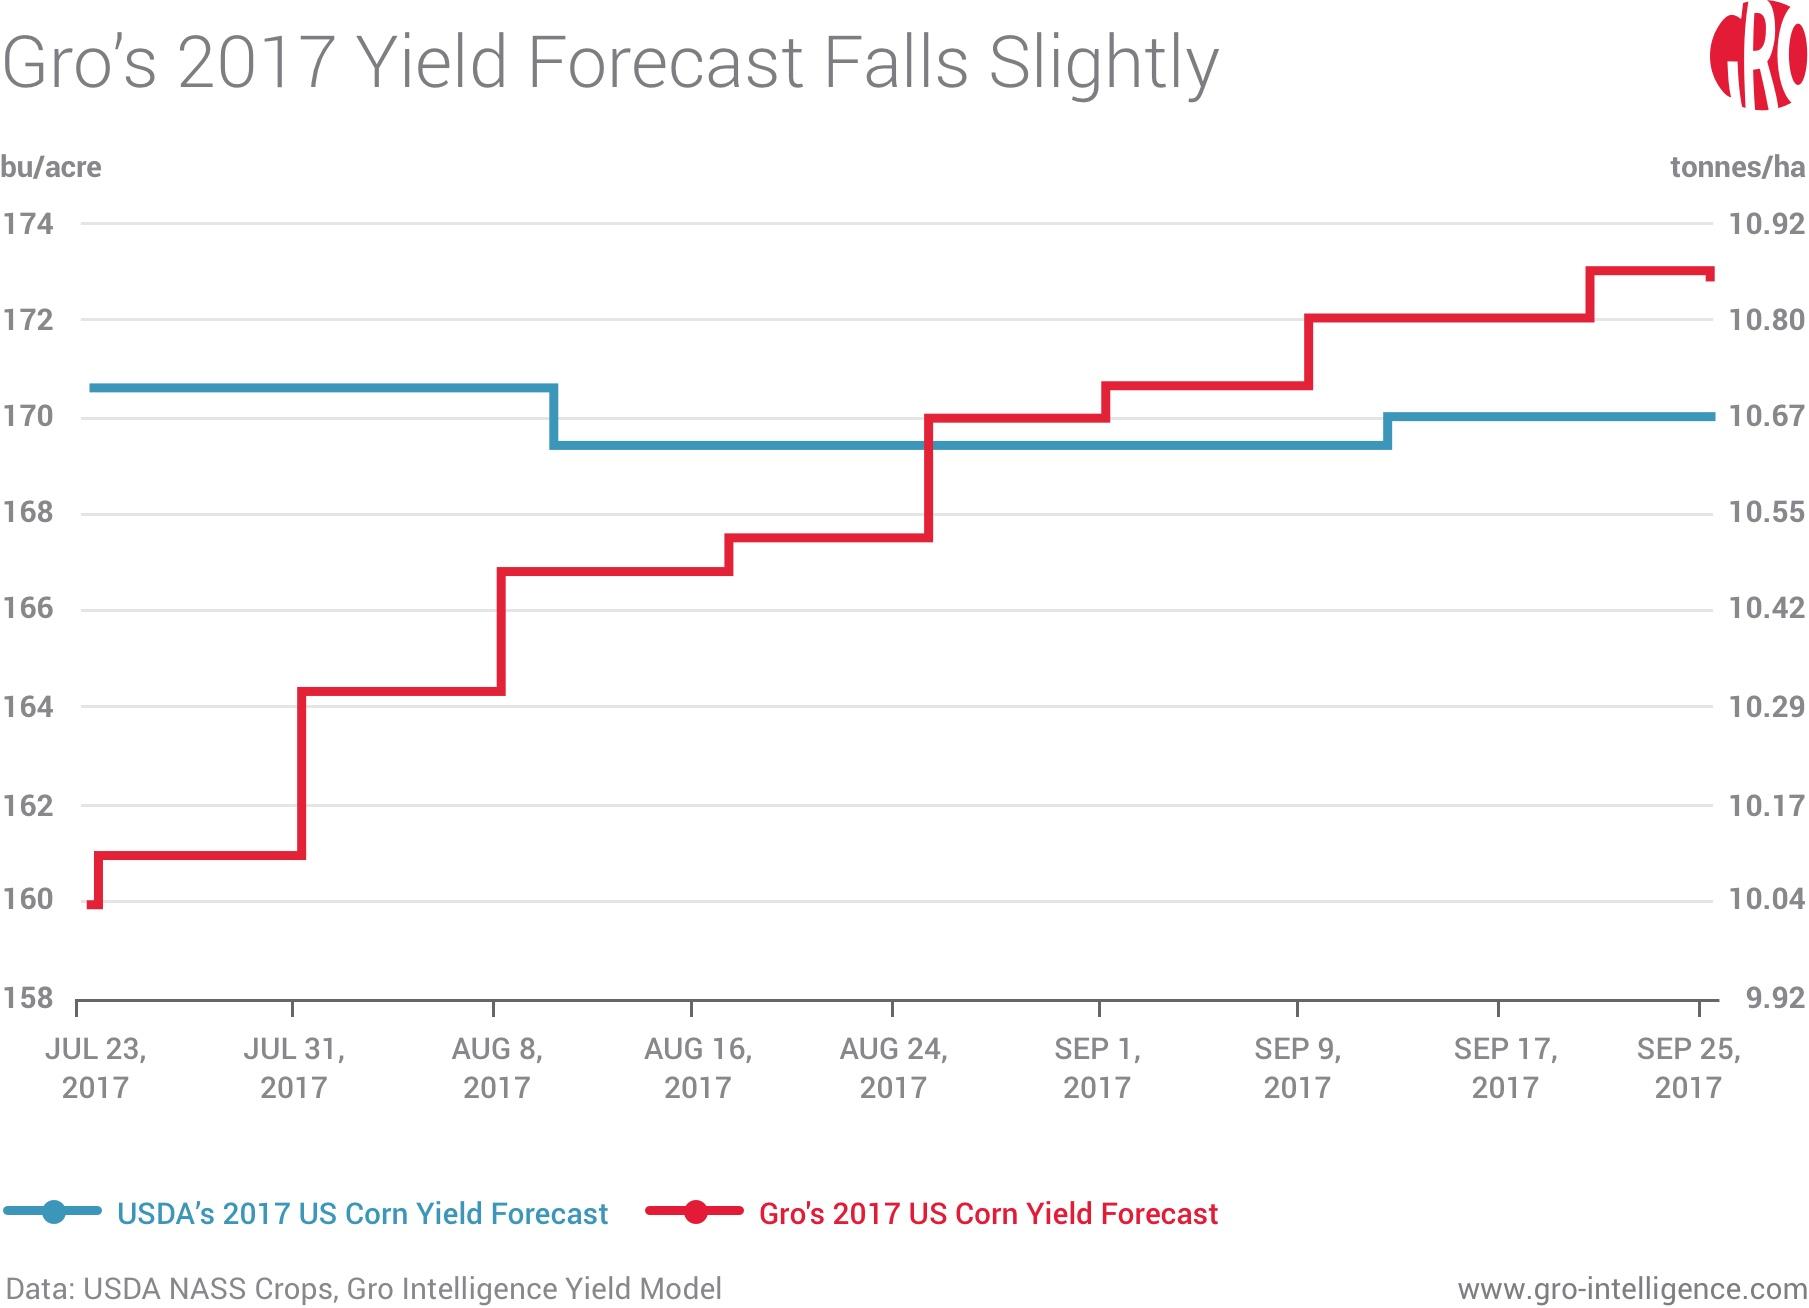 Gro's 2017 Yield Forecast Falls Slightly